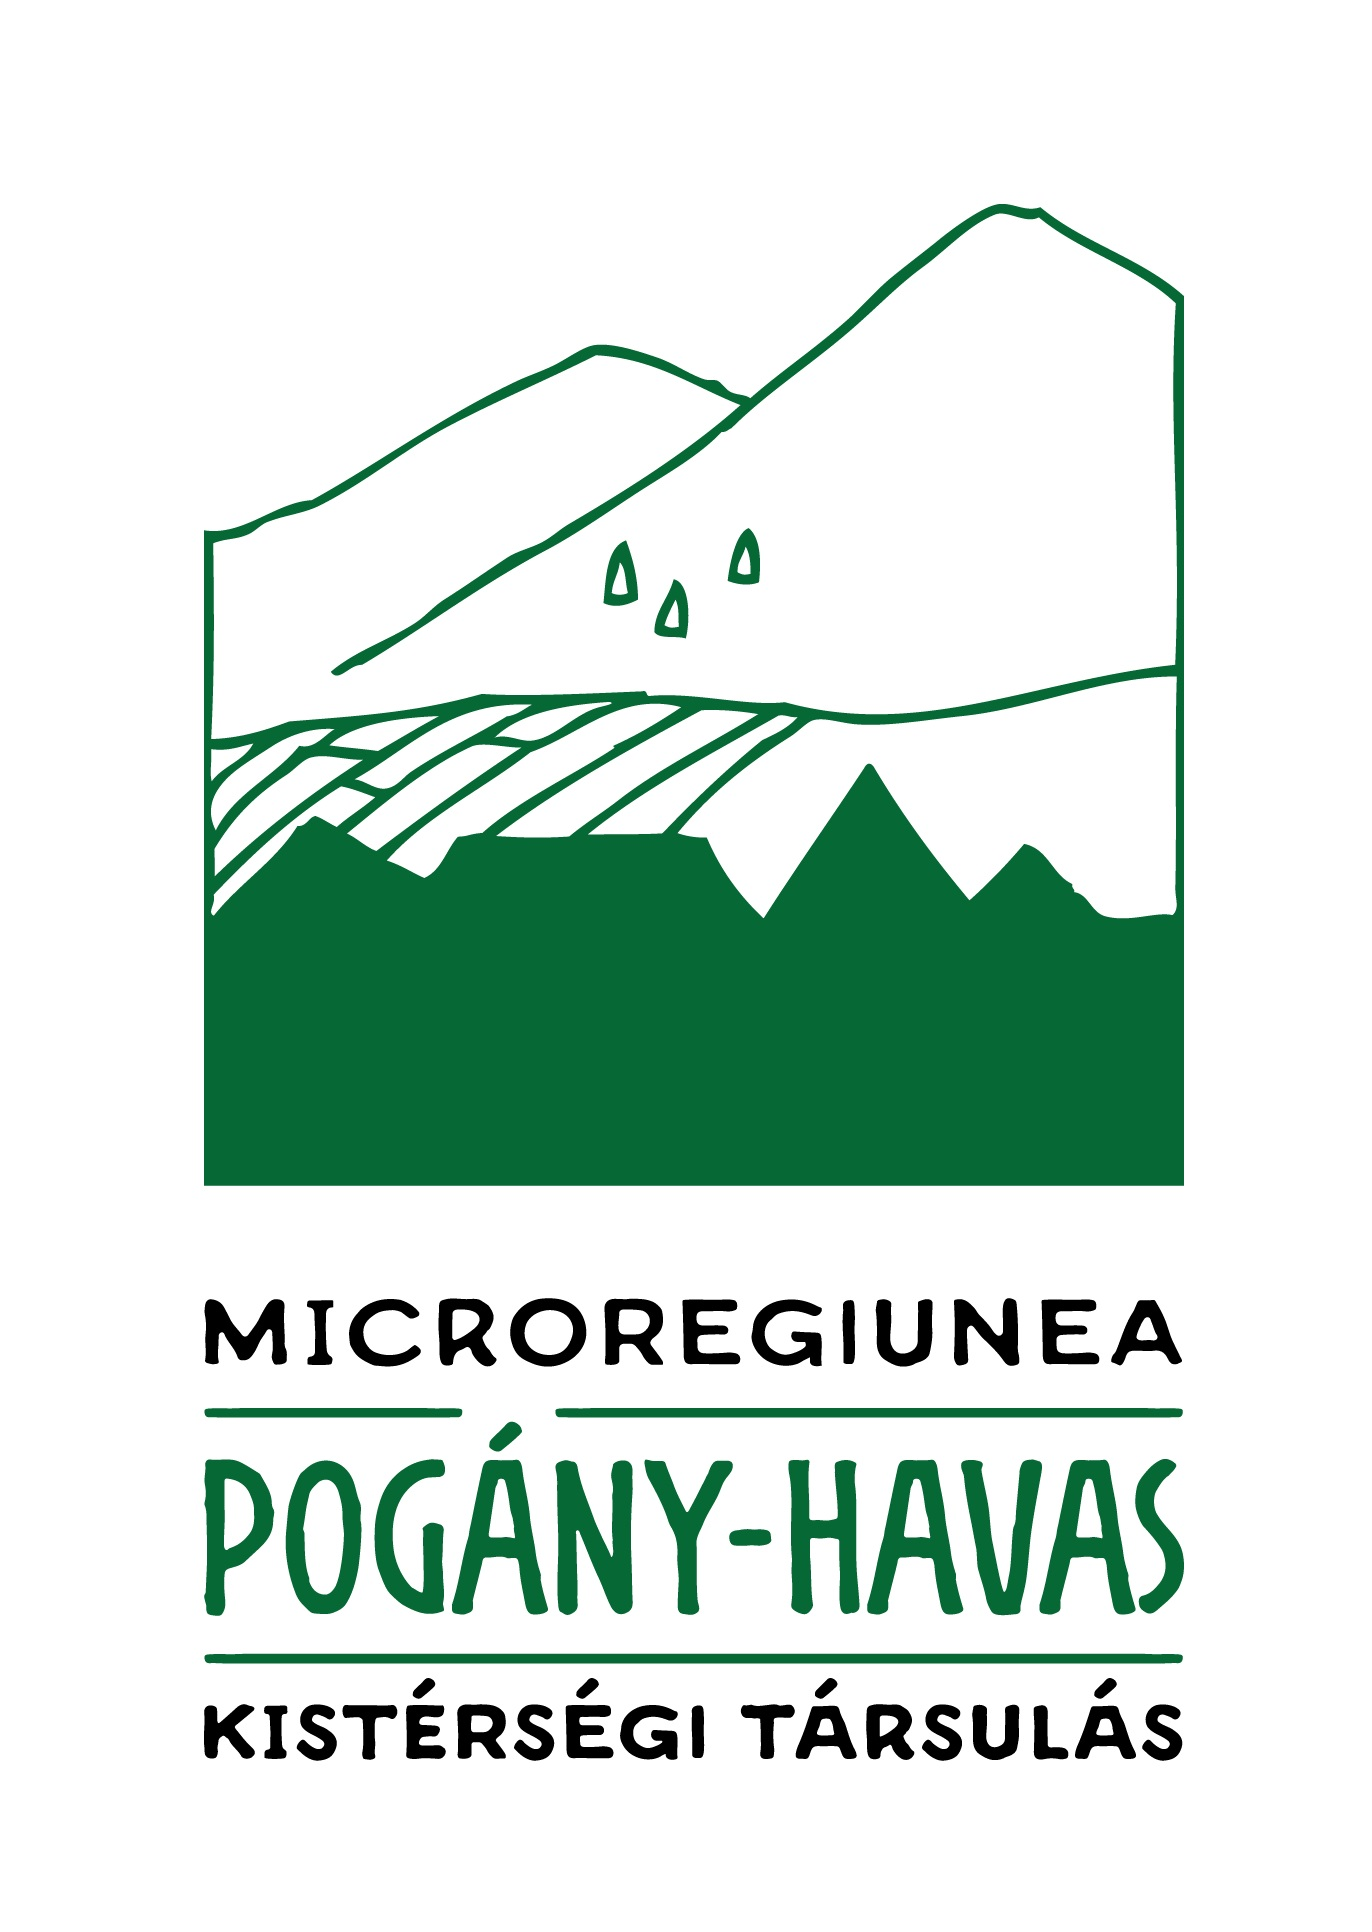 Asociația Microregională Pogány-havas logo